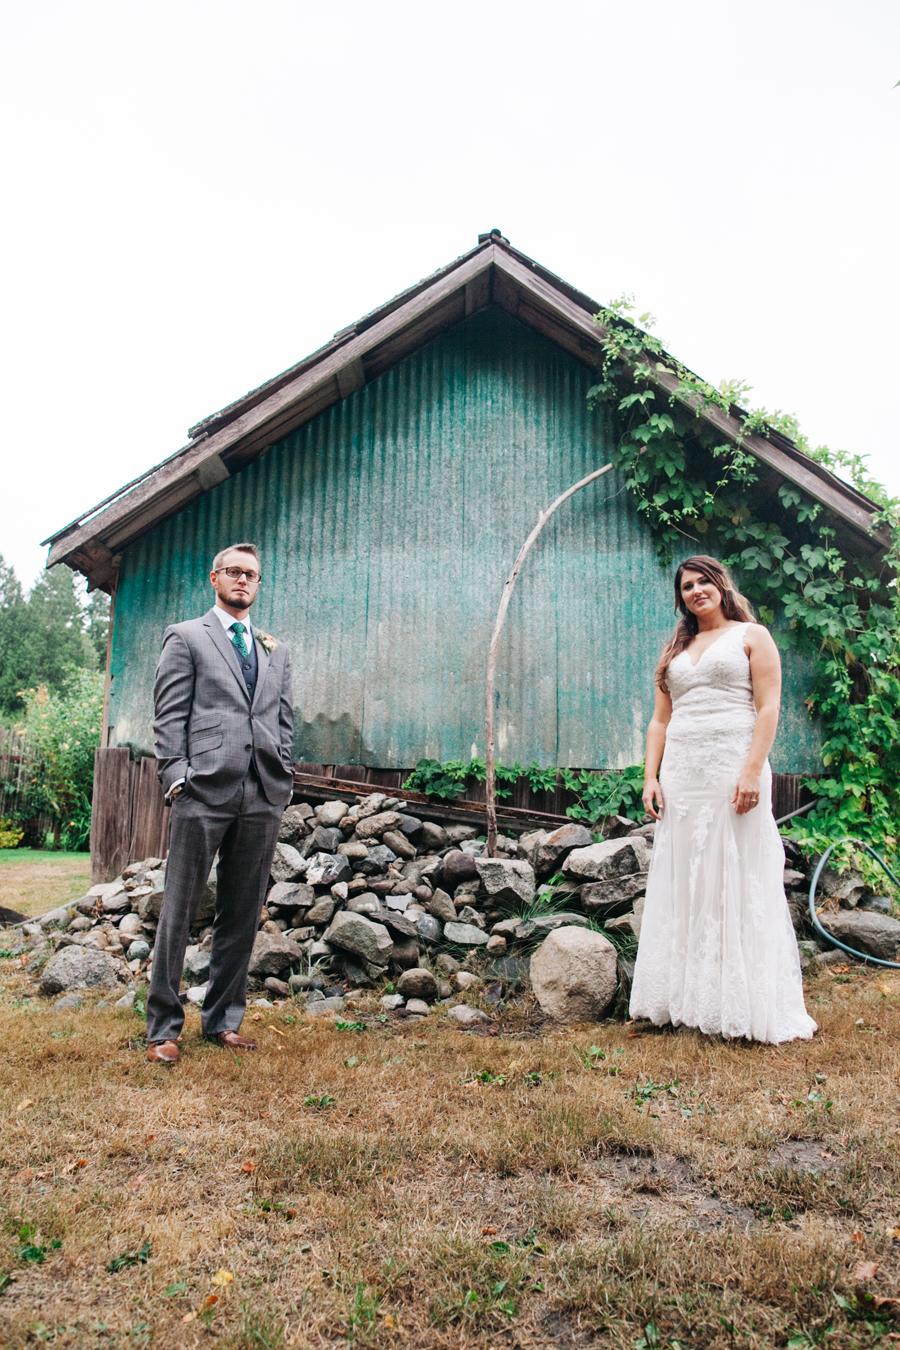 037-bellingham-wedding-photographer-katheryn-moran-photography-farm-kitchen.jpg